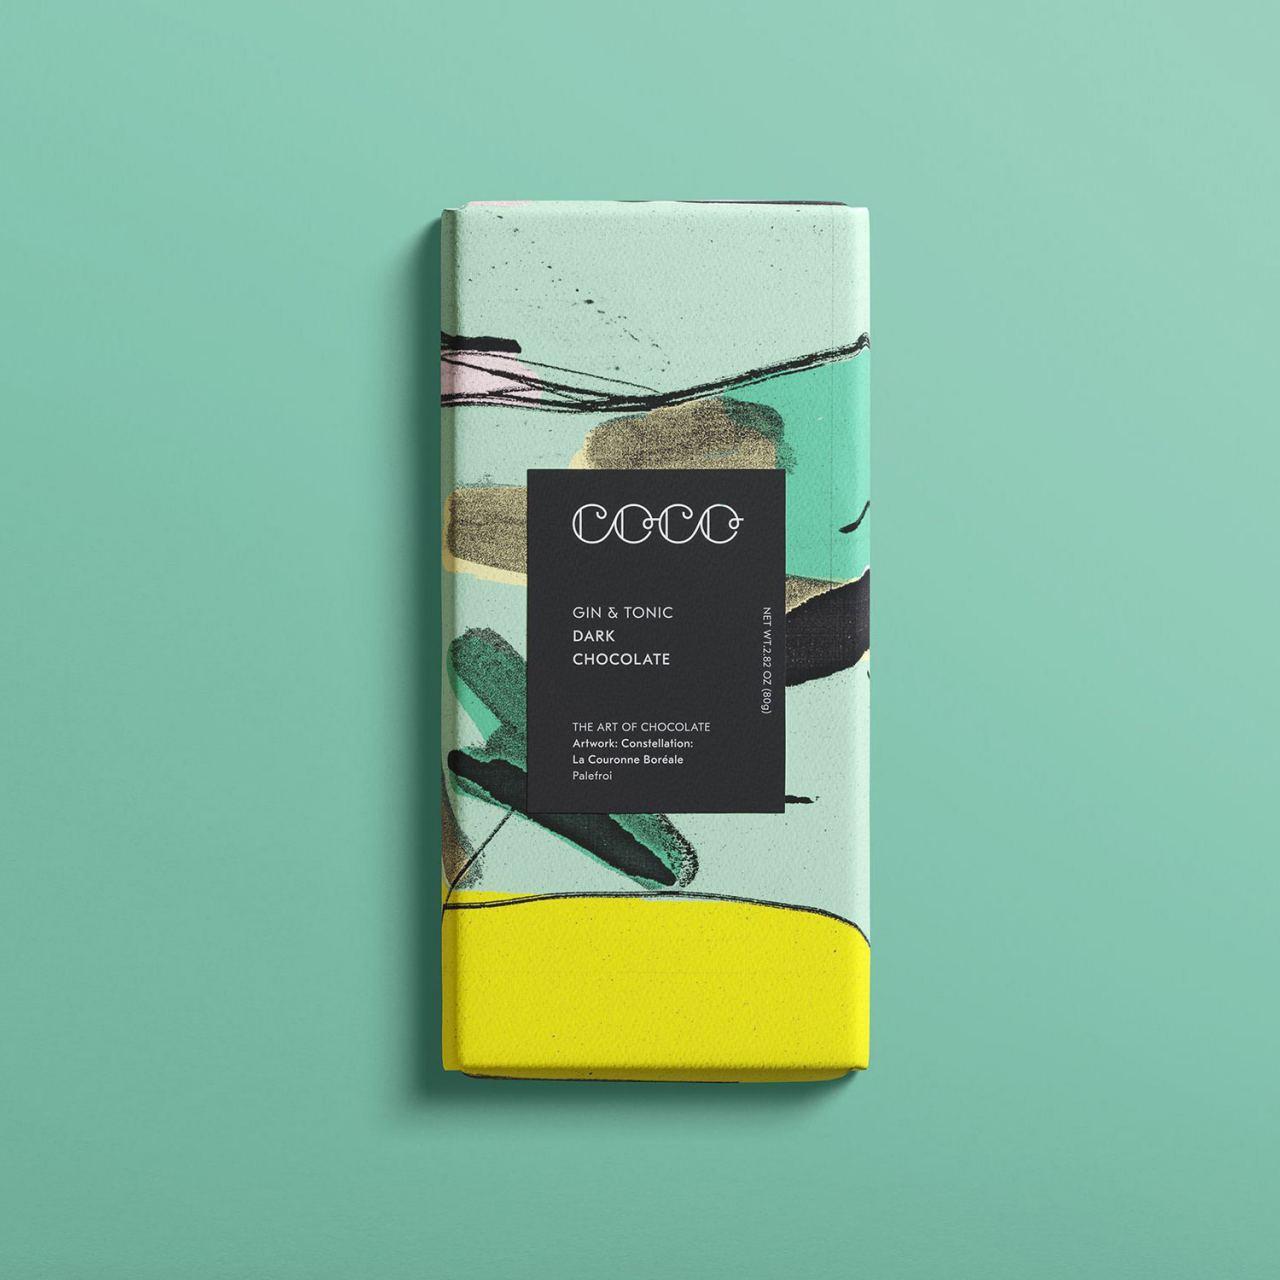 Gin & Tonic Schokolade